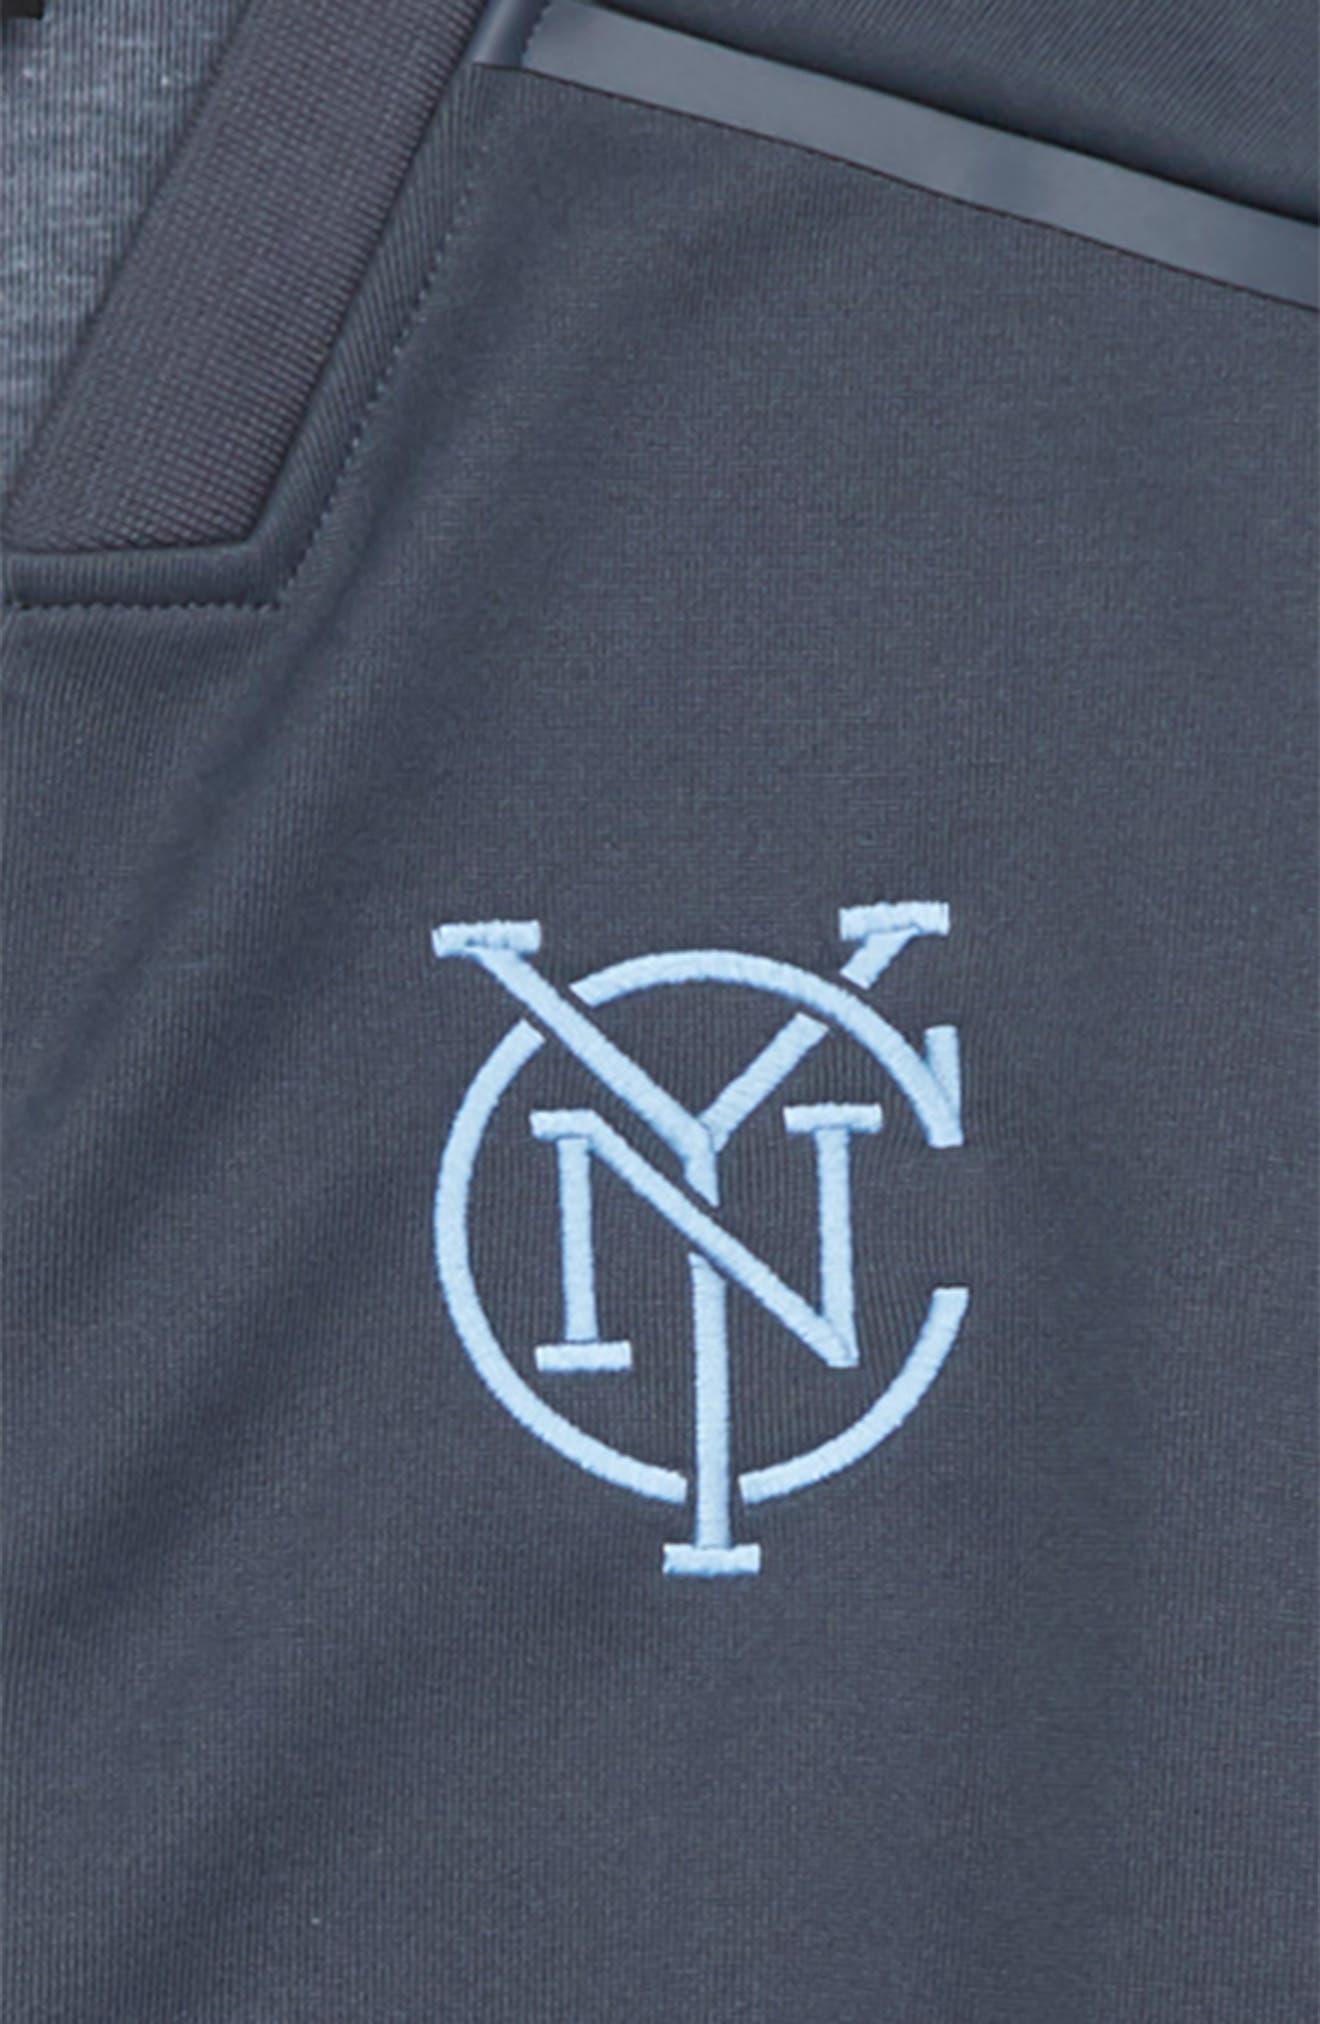 MLS New York City FC Anthem Full Zip Jacket,                             Alternate thumbnail 2, color,                             Utility Blue